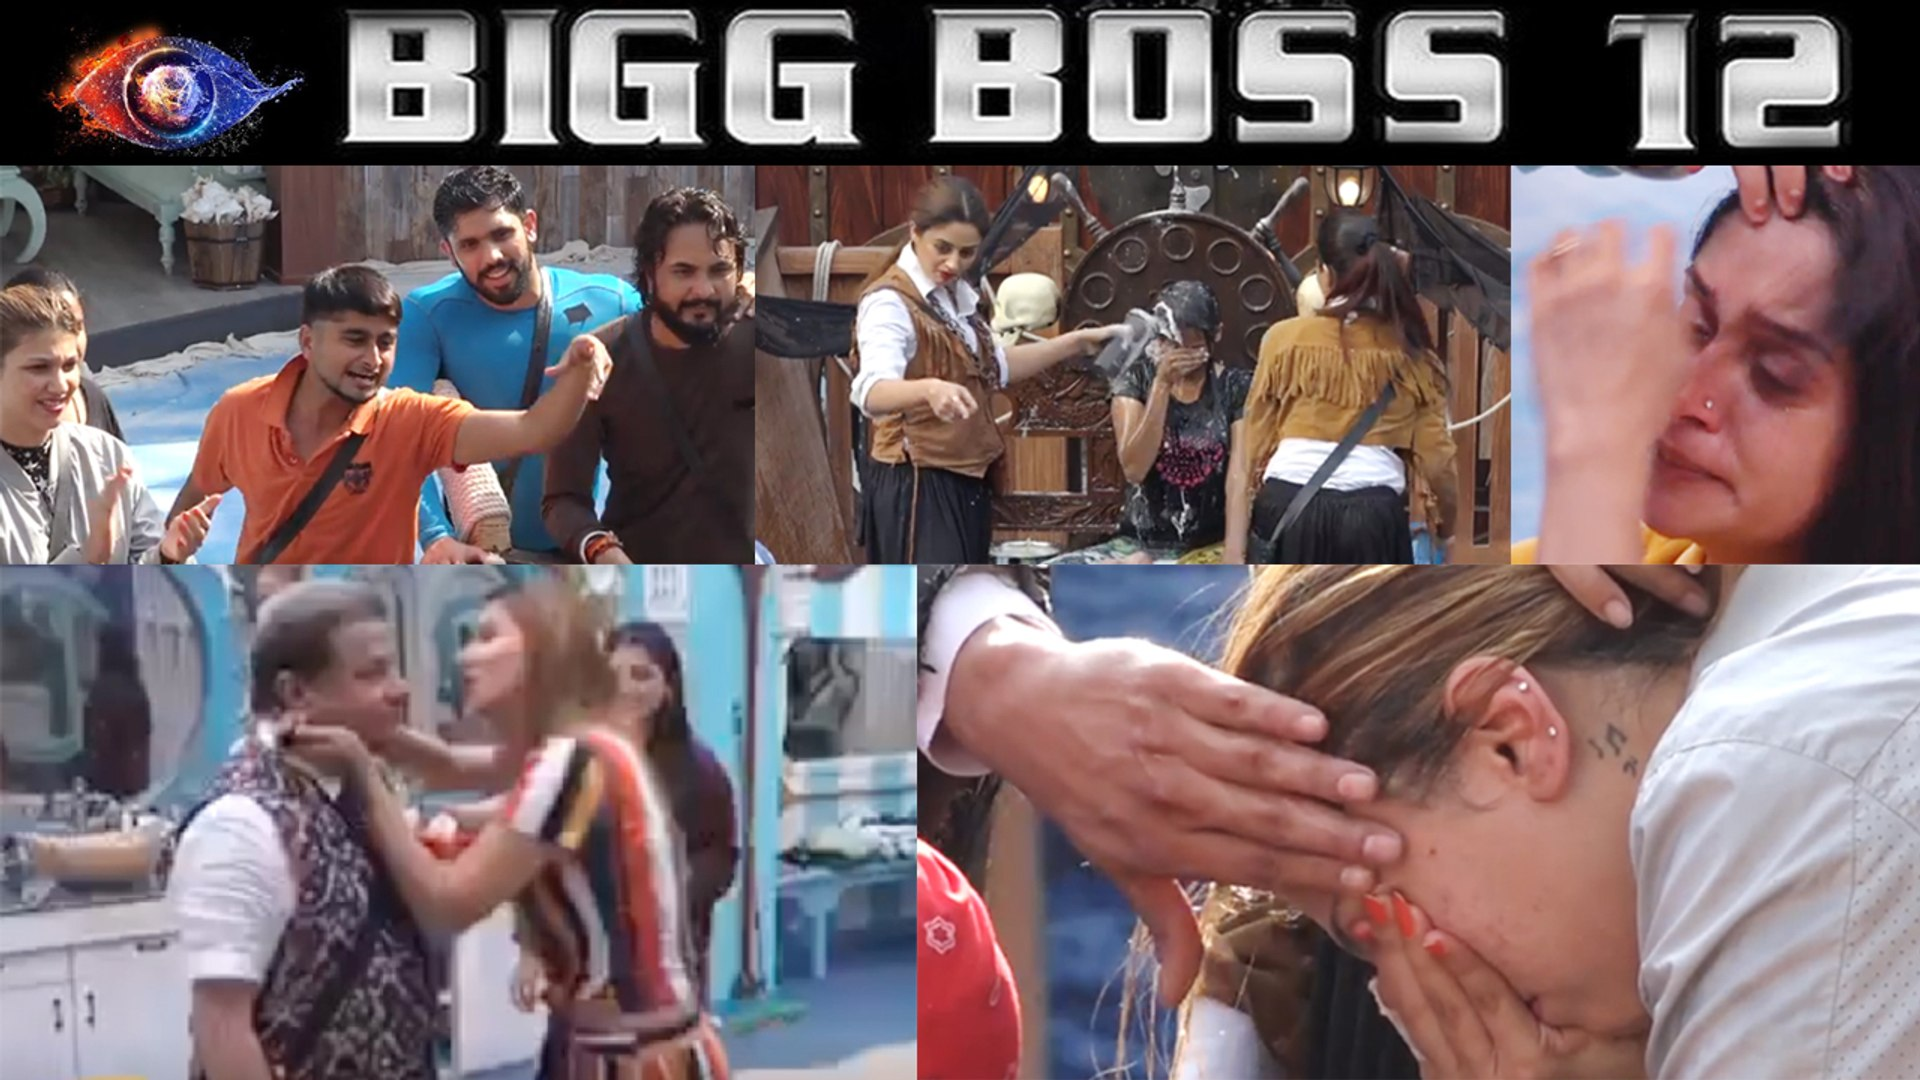 Bigg Boss 12 Day 10 Highlights: Singles Win Luxury Budget, Jasleen to Kiss Anup Jalota | FilmiBeat